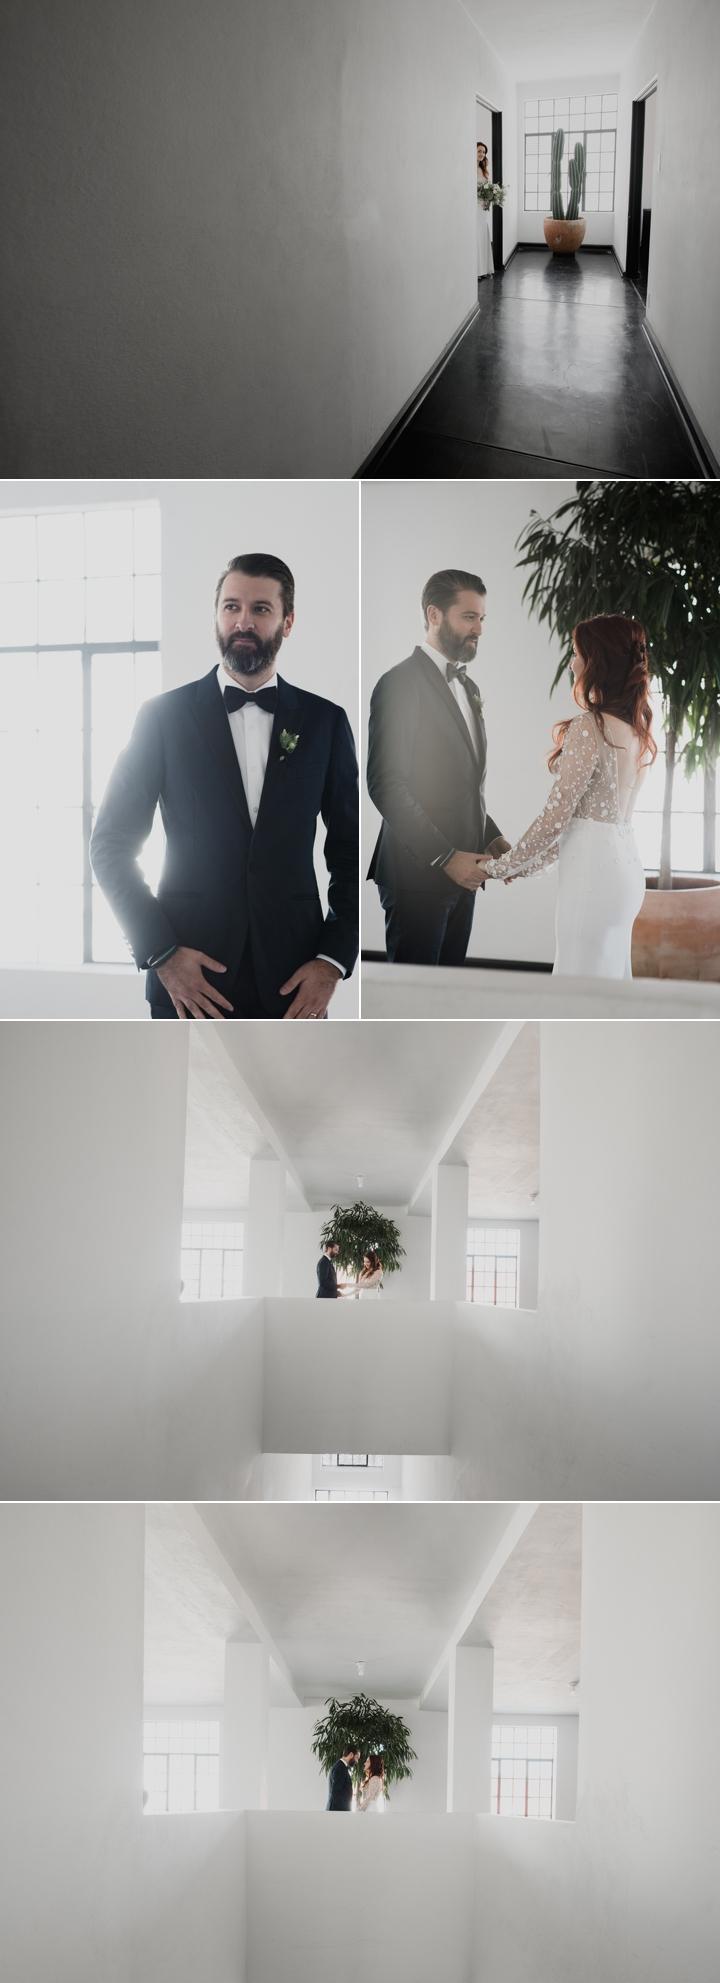 marfa-texas-weddings-photographers 19.jpg